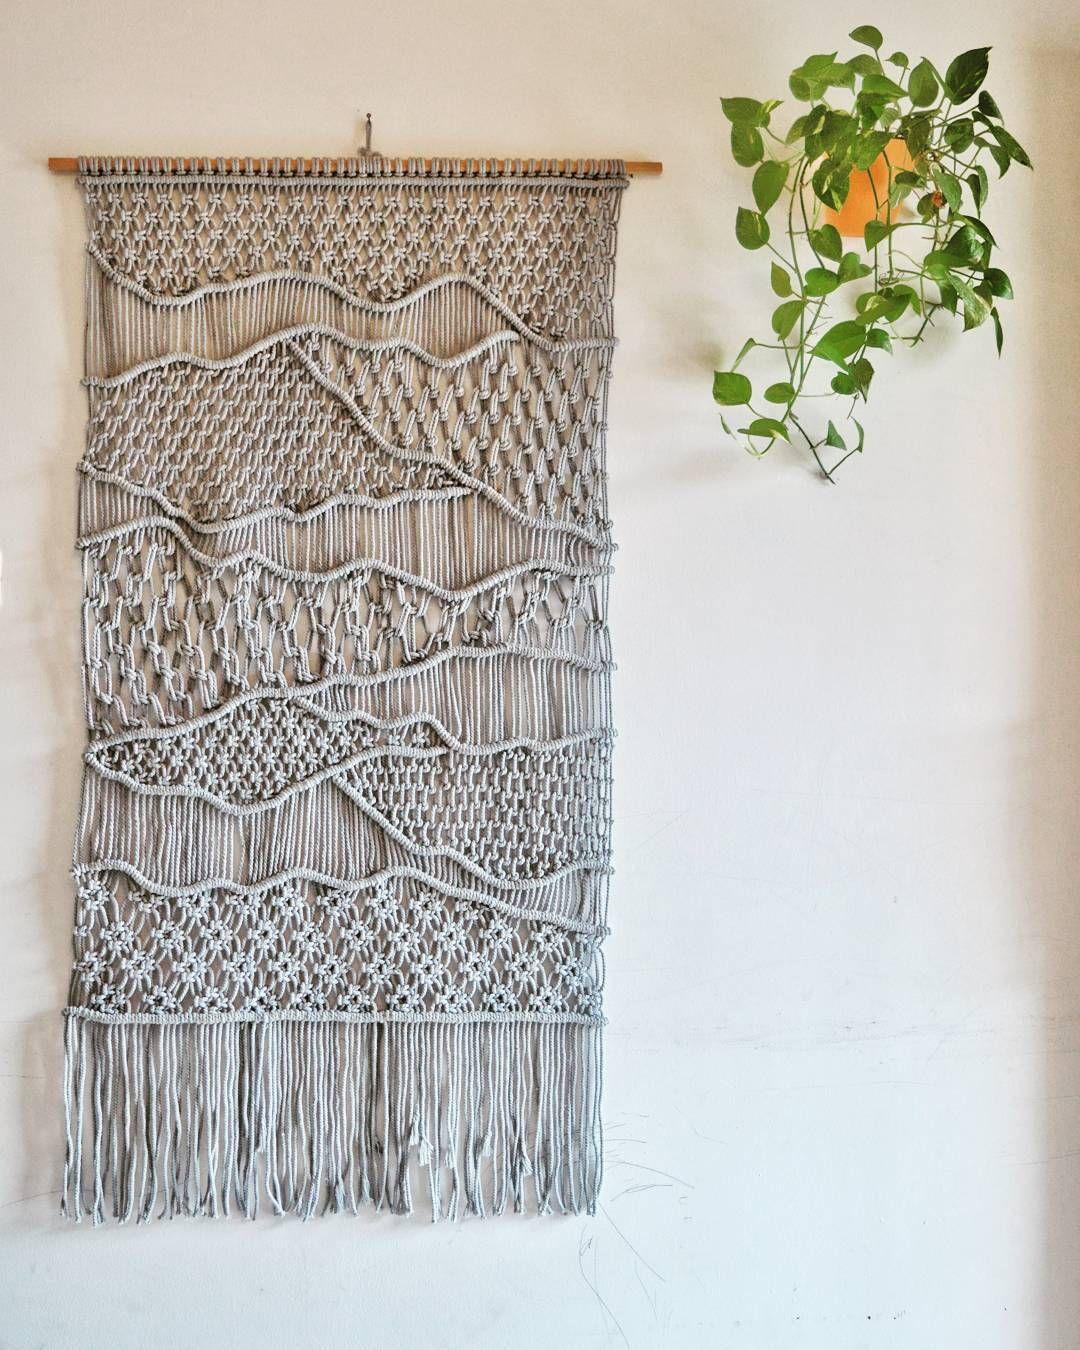 500+ Ideias De Crochê Em 2021 | Crochê, Tricô E Crochê Throughout Current Blended Fabric Saber Wall Hangings With Rod (View 17 of 20)